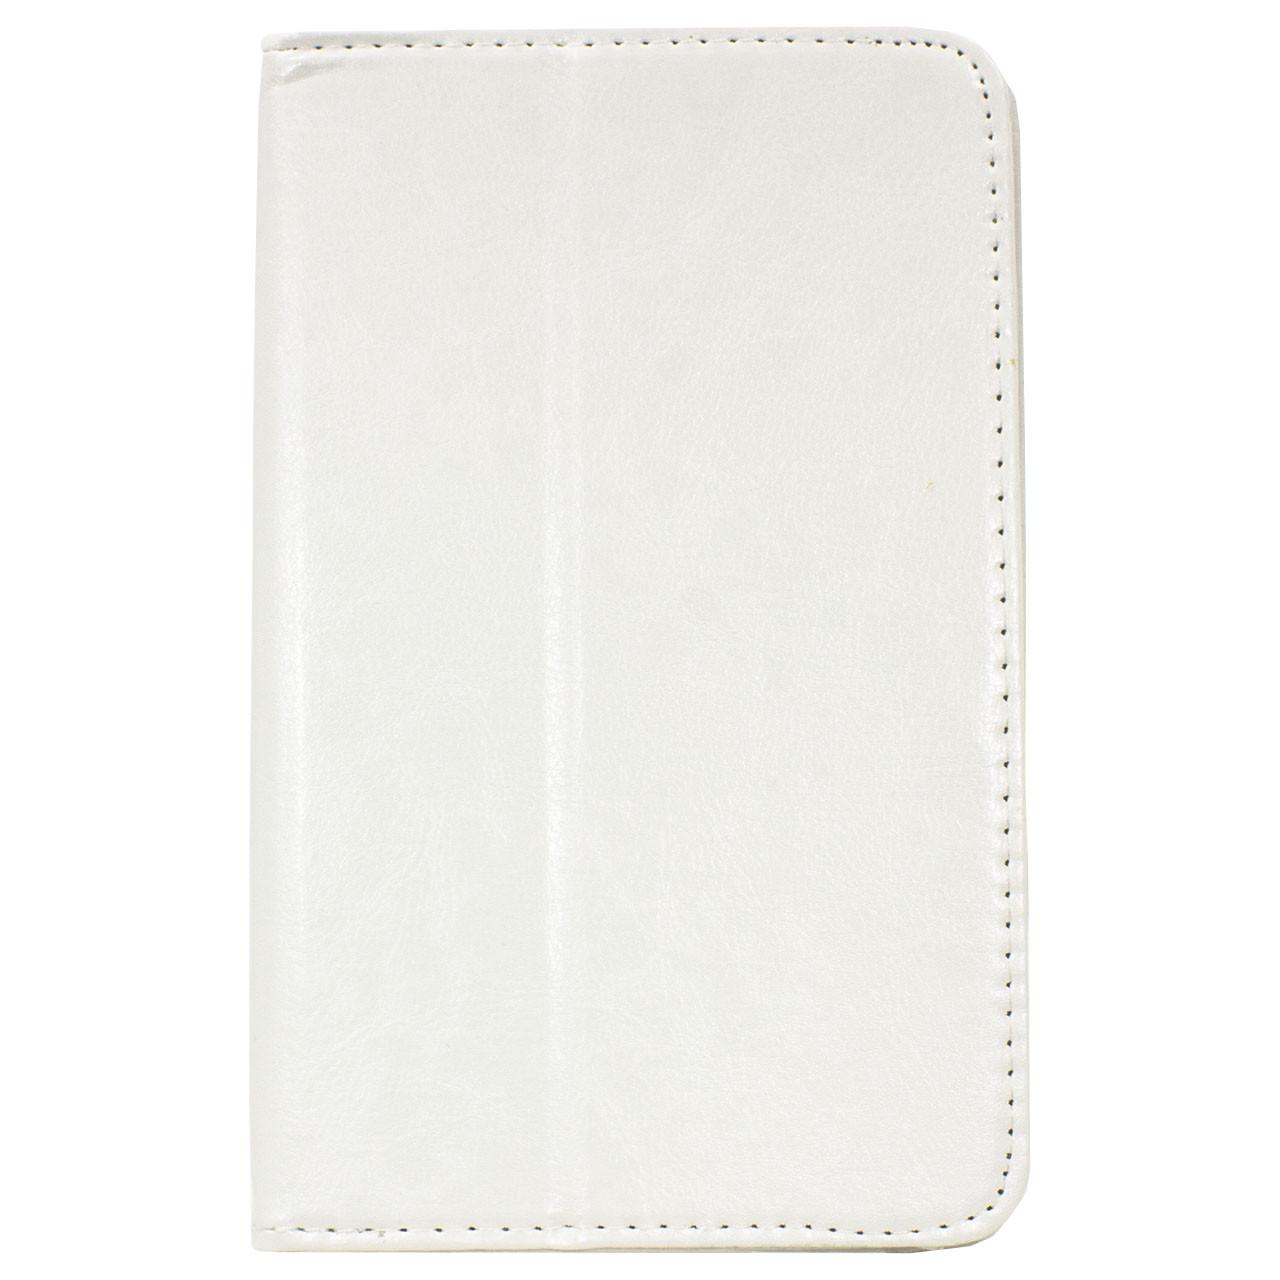 ✸Чехол LESKO Call 7 White подставка для планшета от повреждений